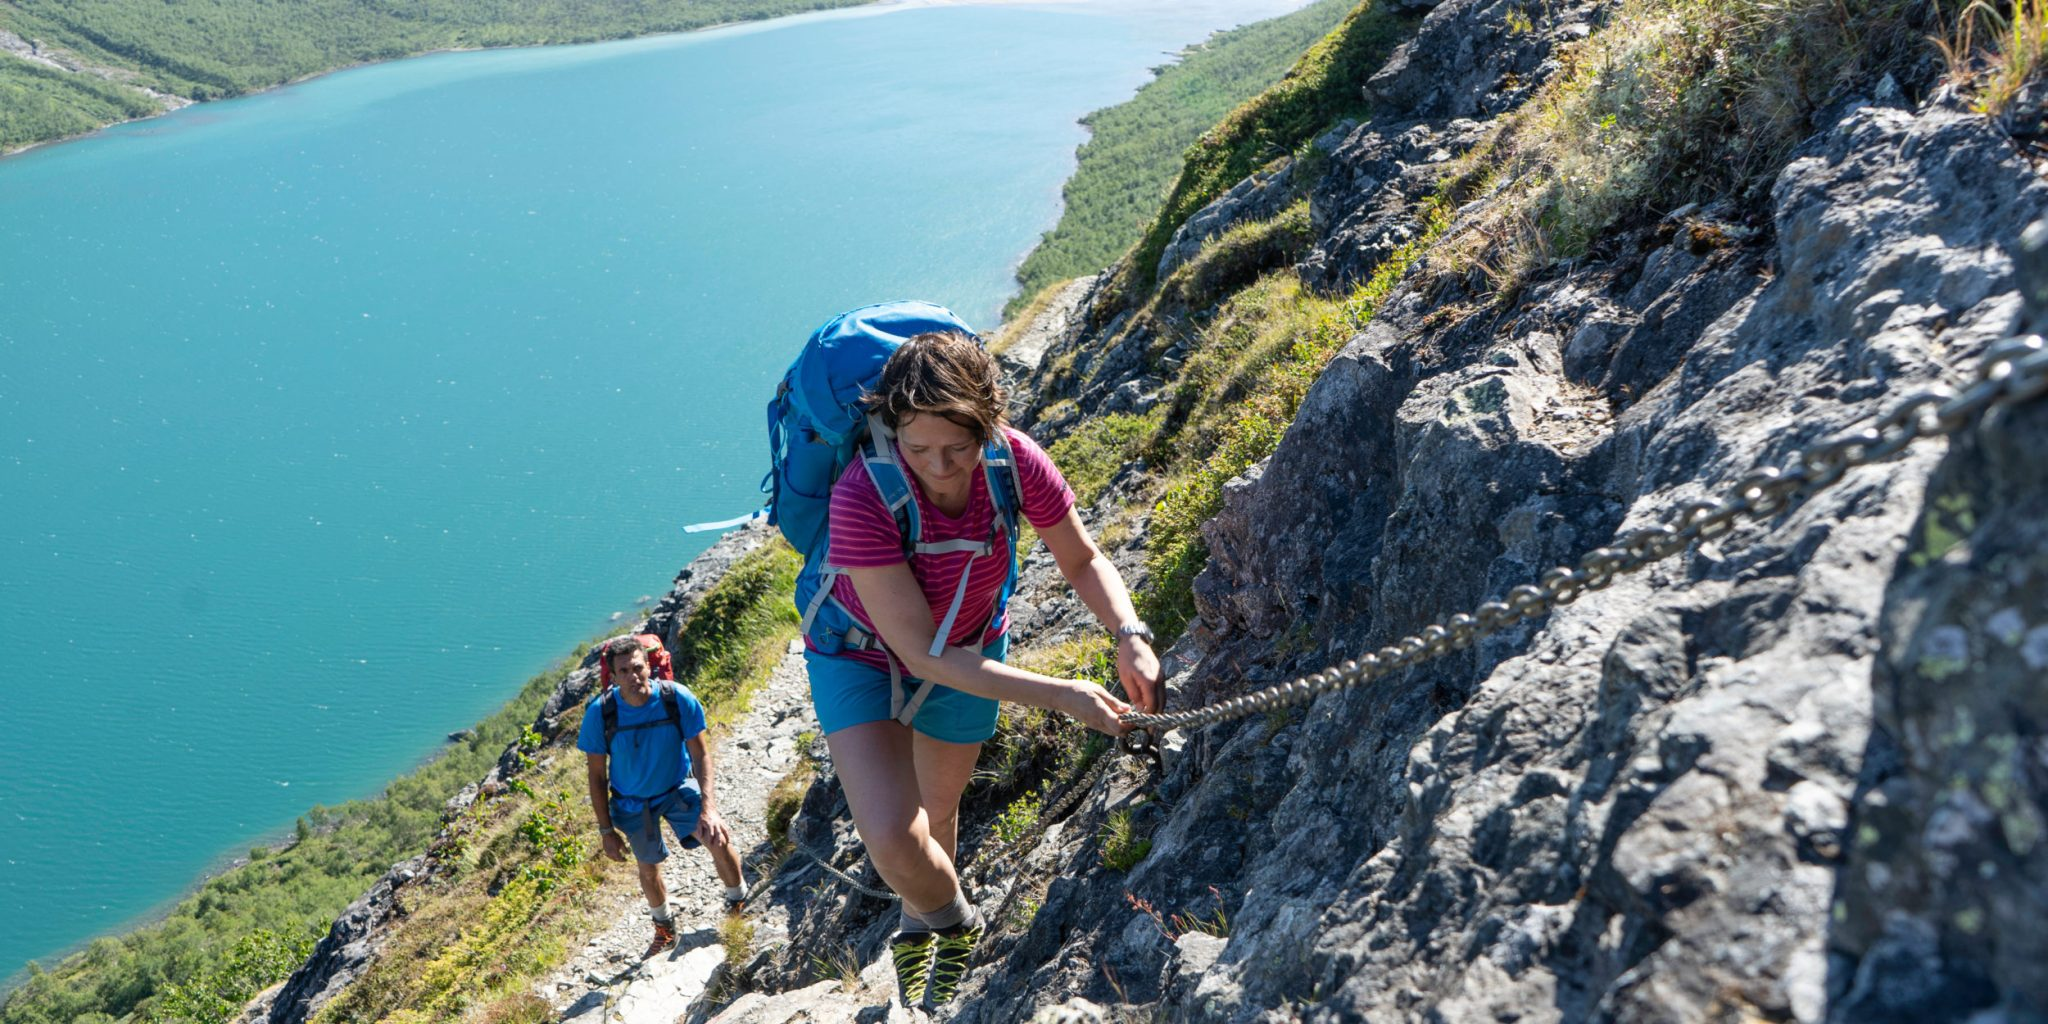 Climbing the Bukkelægret Ridge